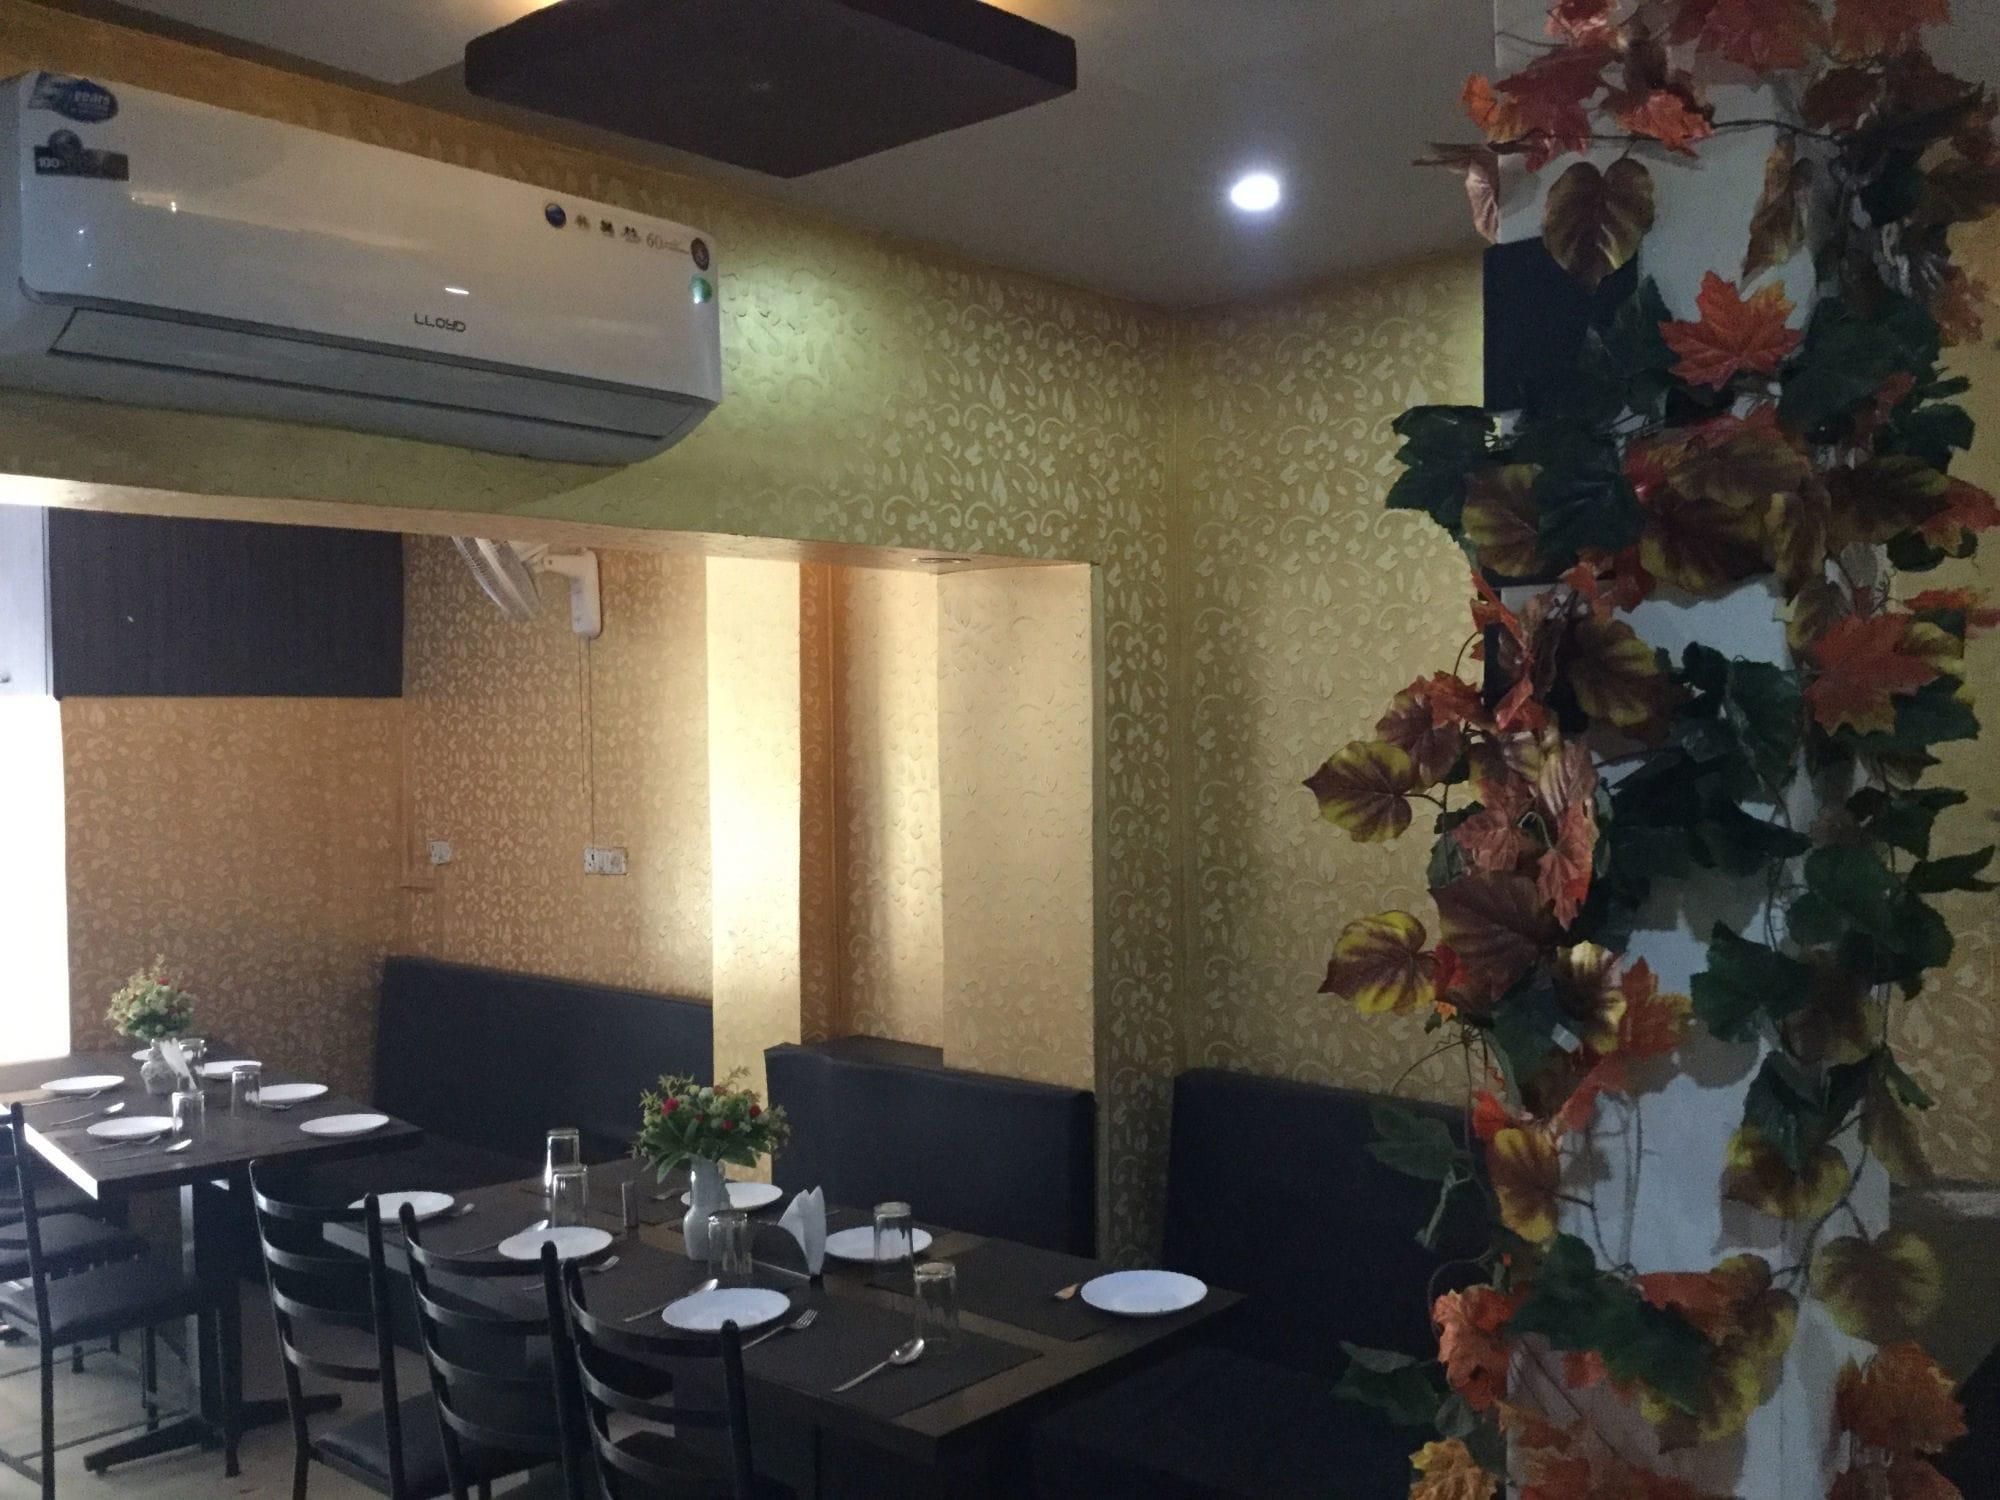 Top 10 Mughlai Restaurants Near Carmel Junior College Sonari